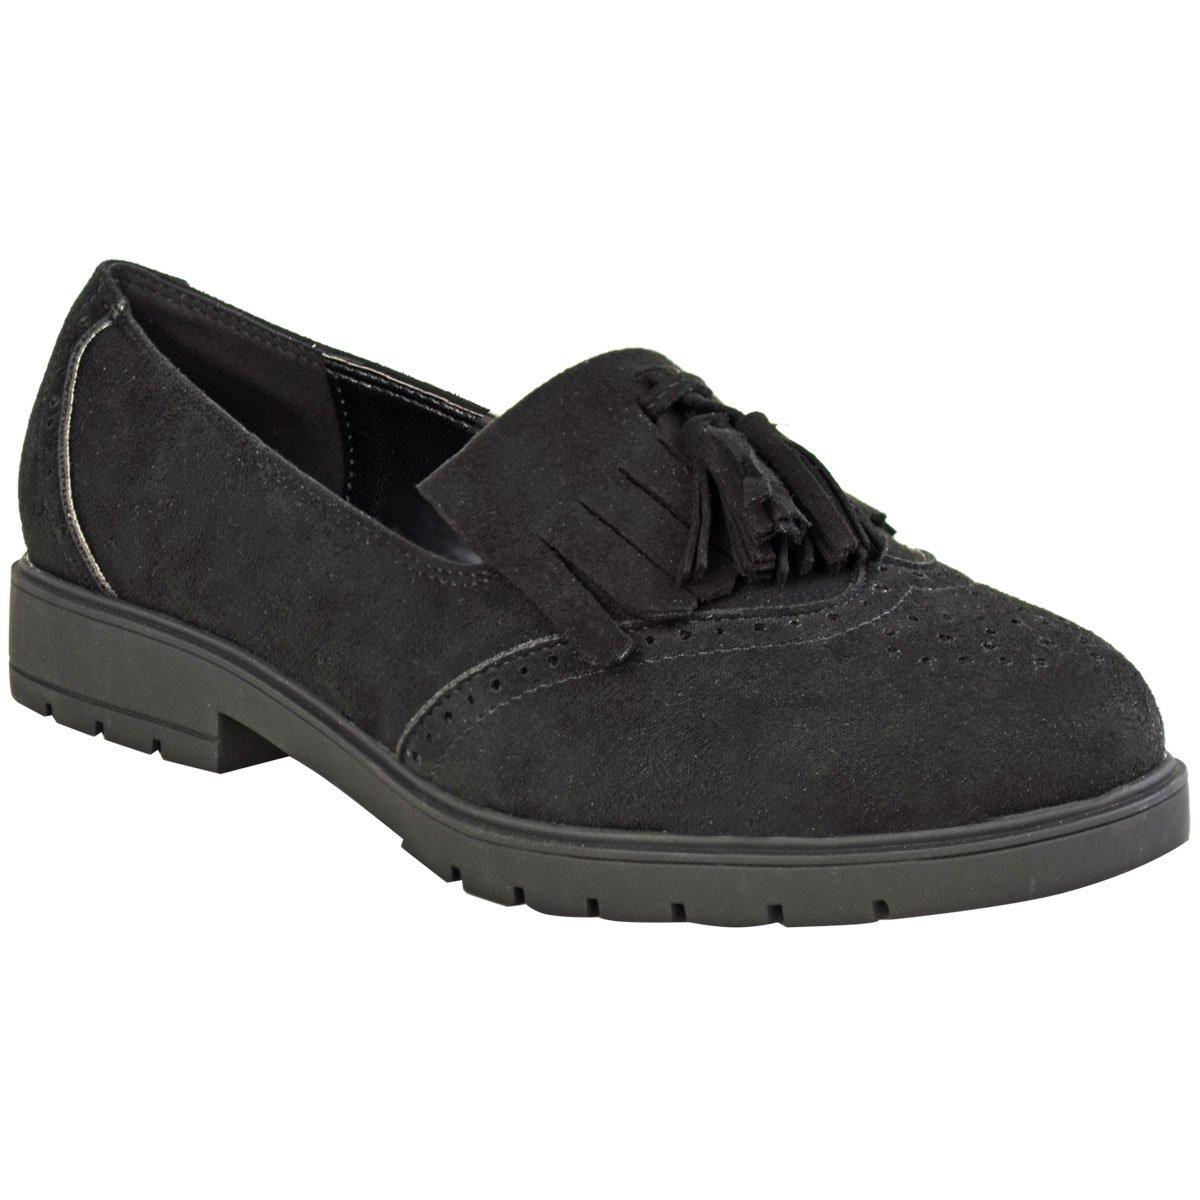 Dames Plat Décontracté Femmes Thirsty Fashion Chaussures reQdoCxBW